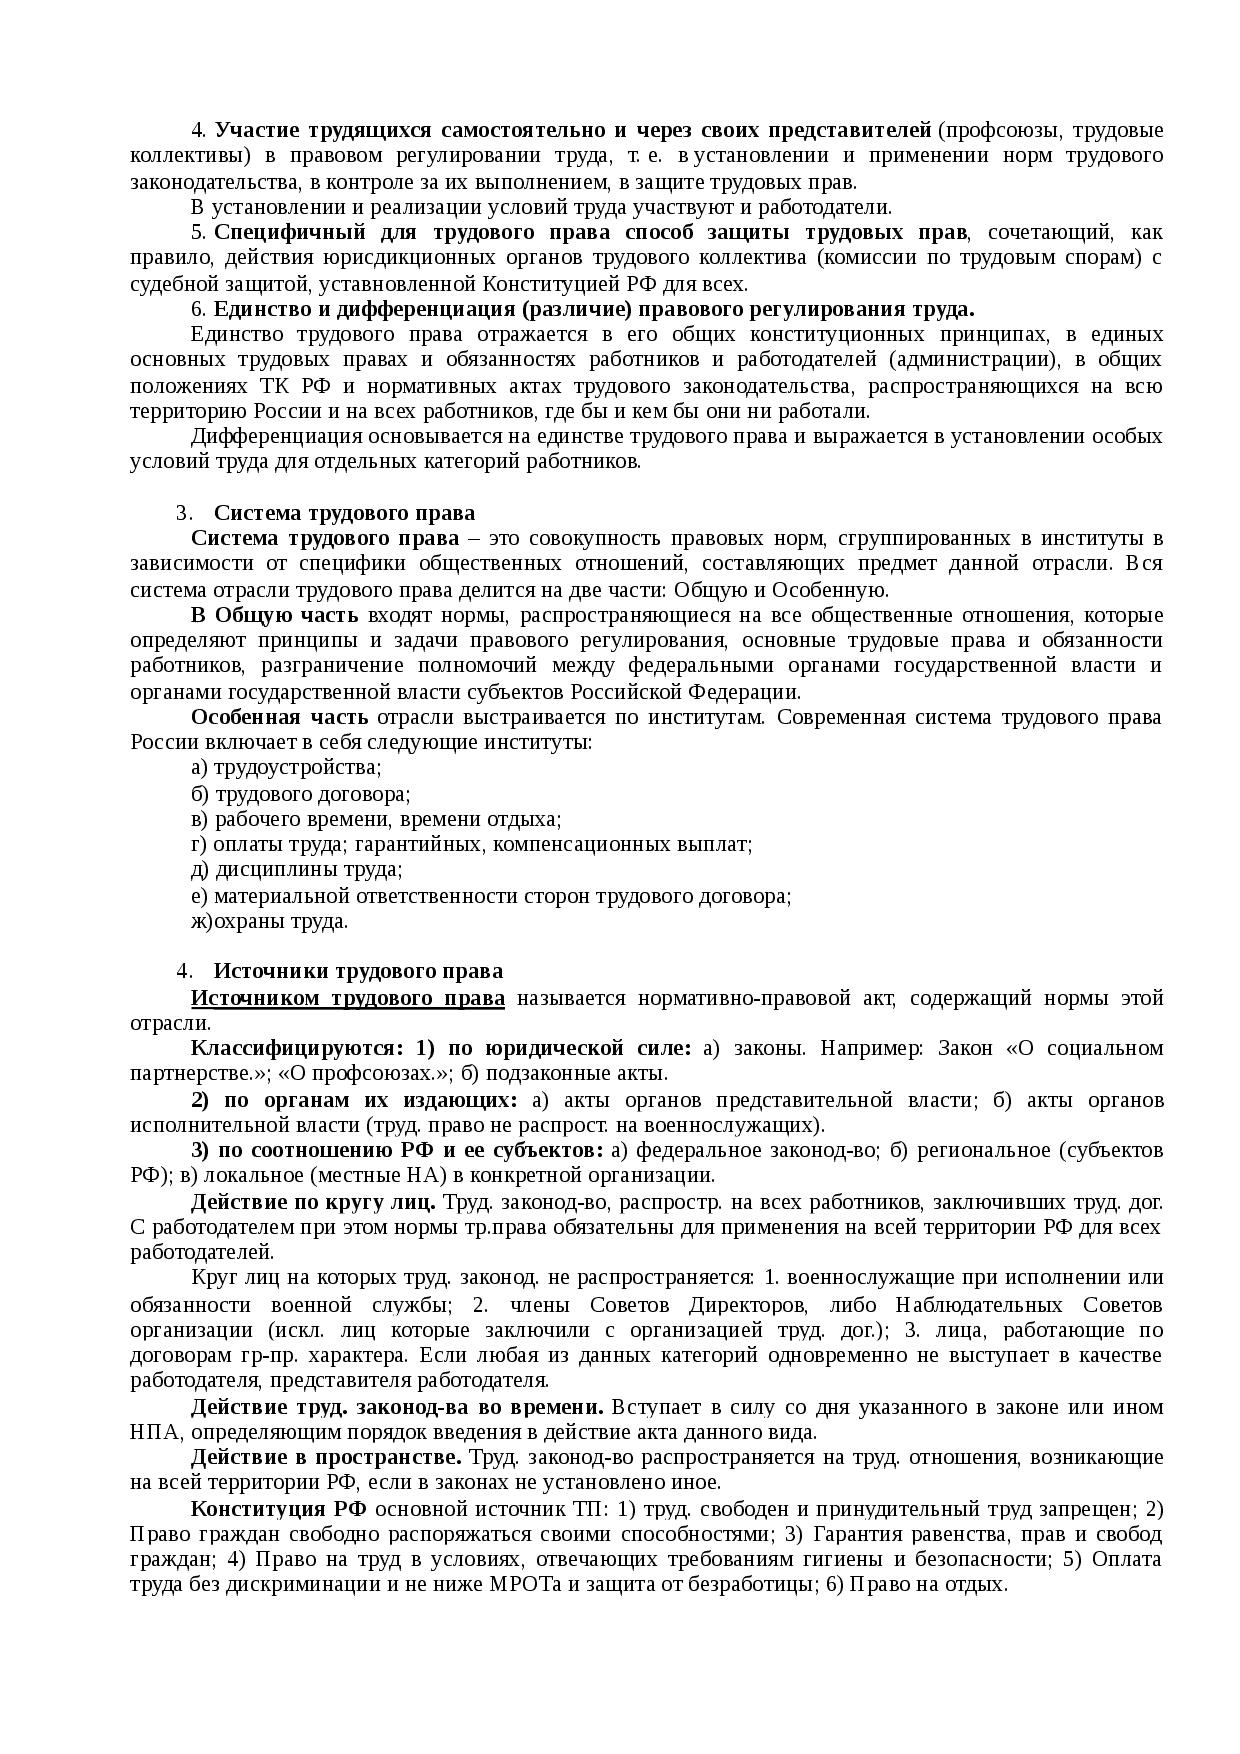 trud-zhenshhin-kakova-realnost-garantij-i-kompensaczij-2